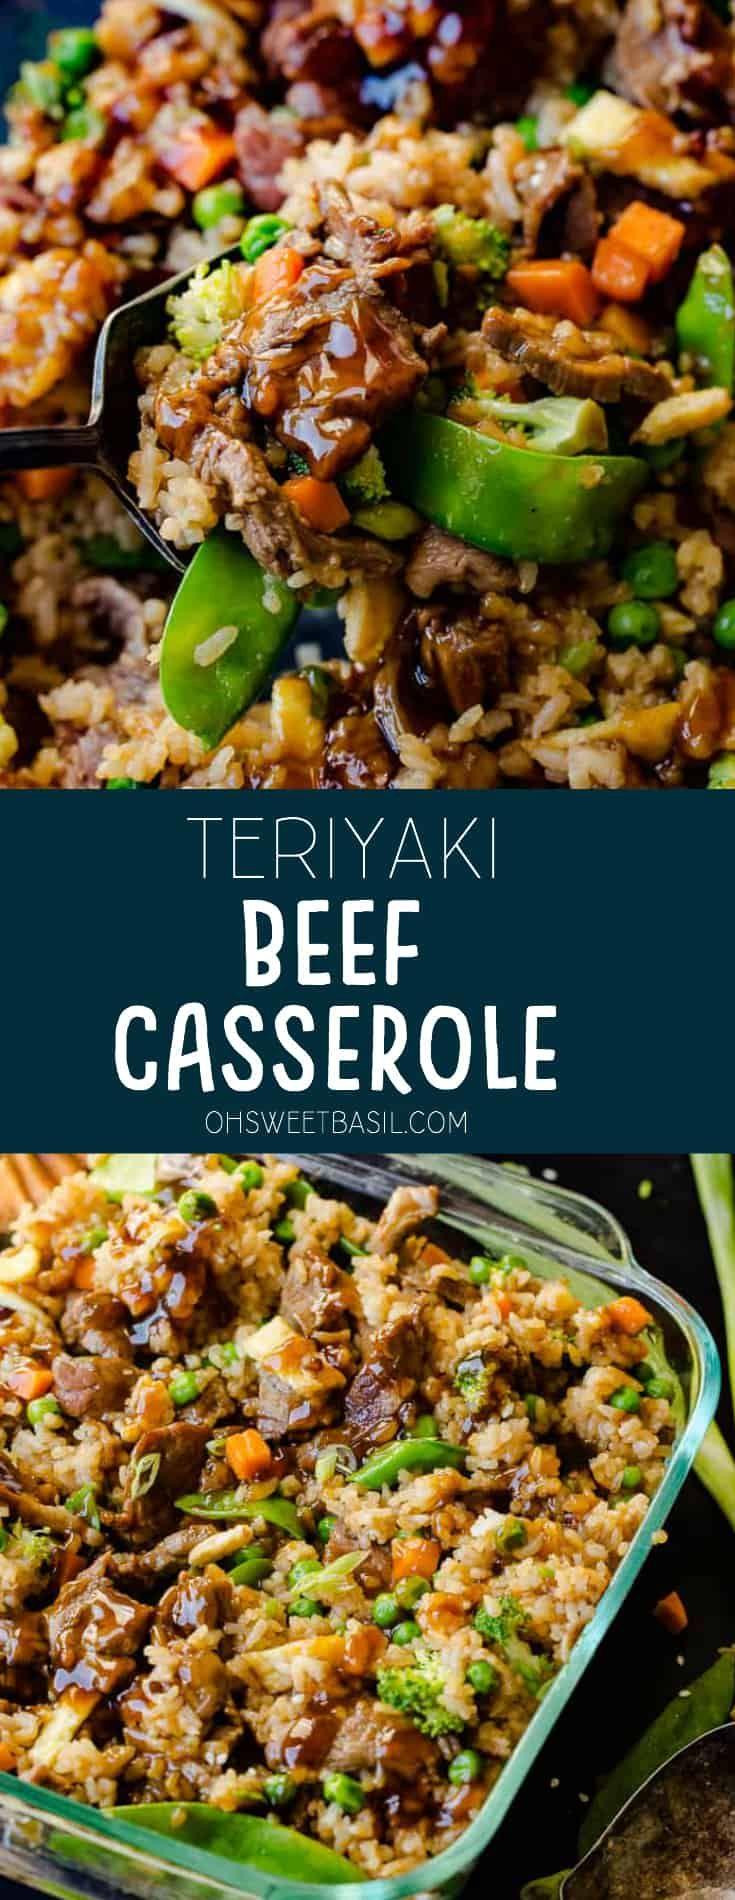 Teriyaki Beef Casserole images